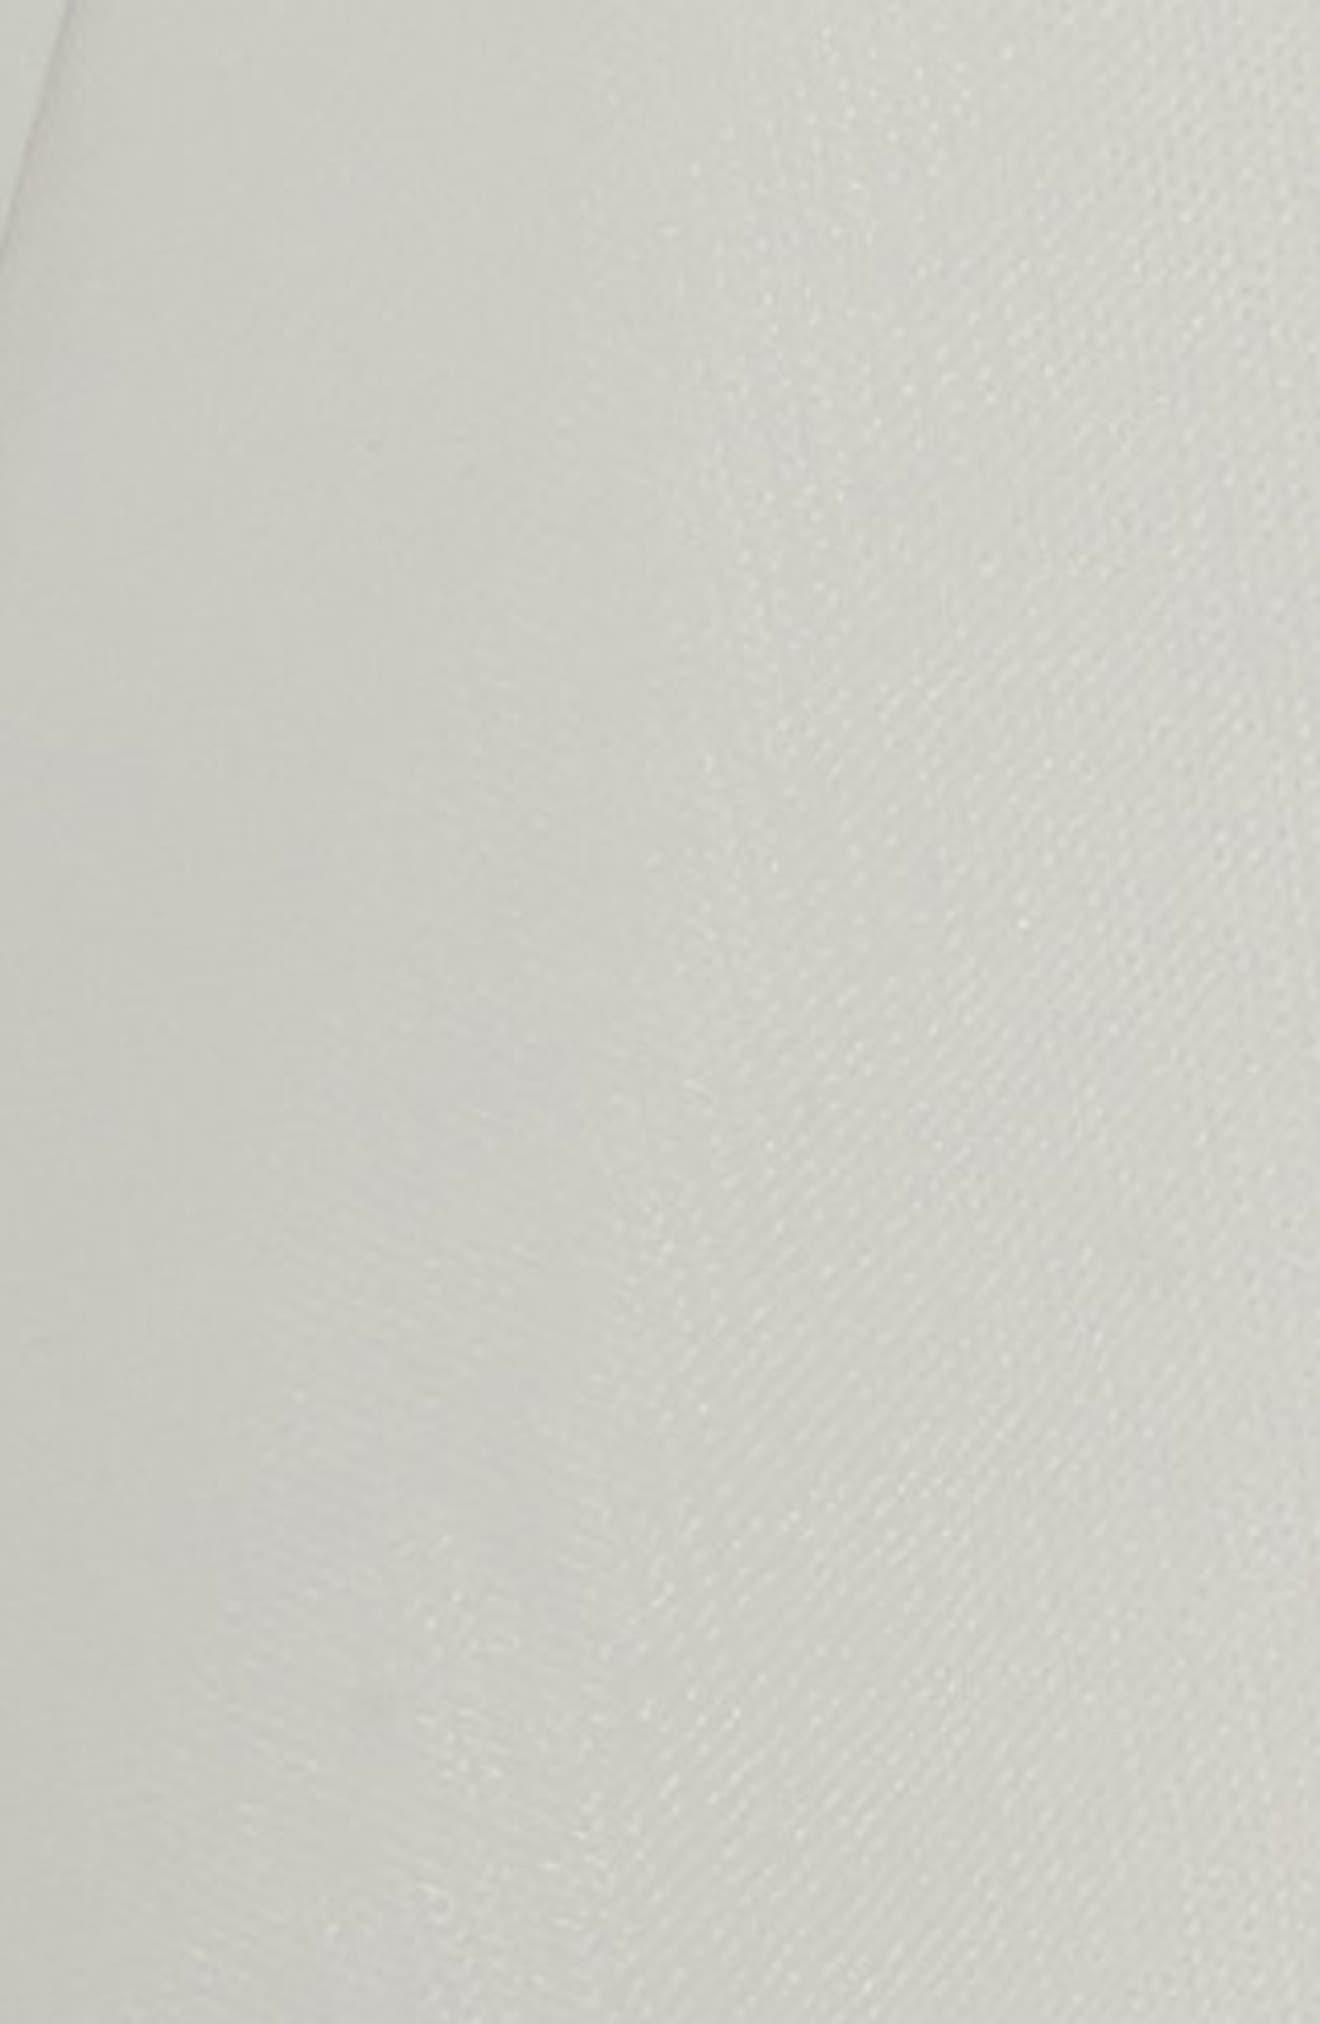 Dulcie Circular Fingertip Veil,                             Alternate thumbnail 2, color,                             Light Ivory